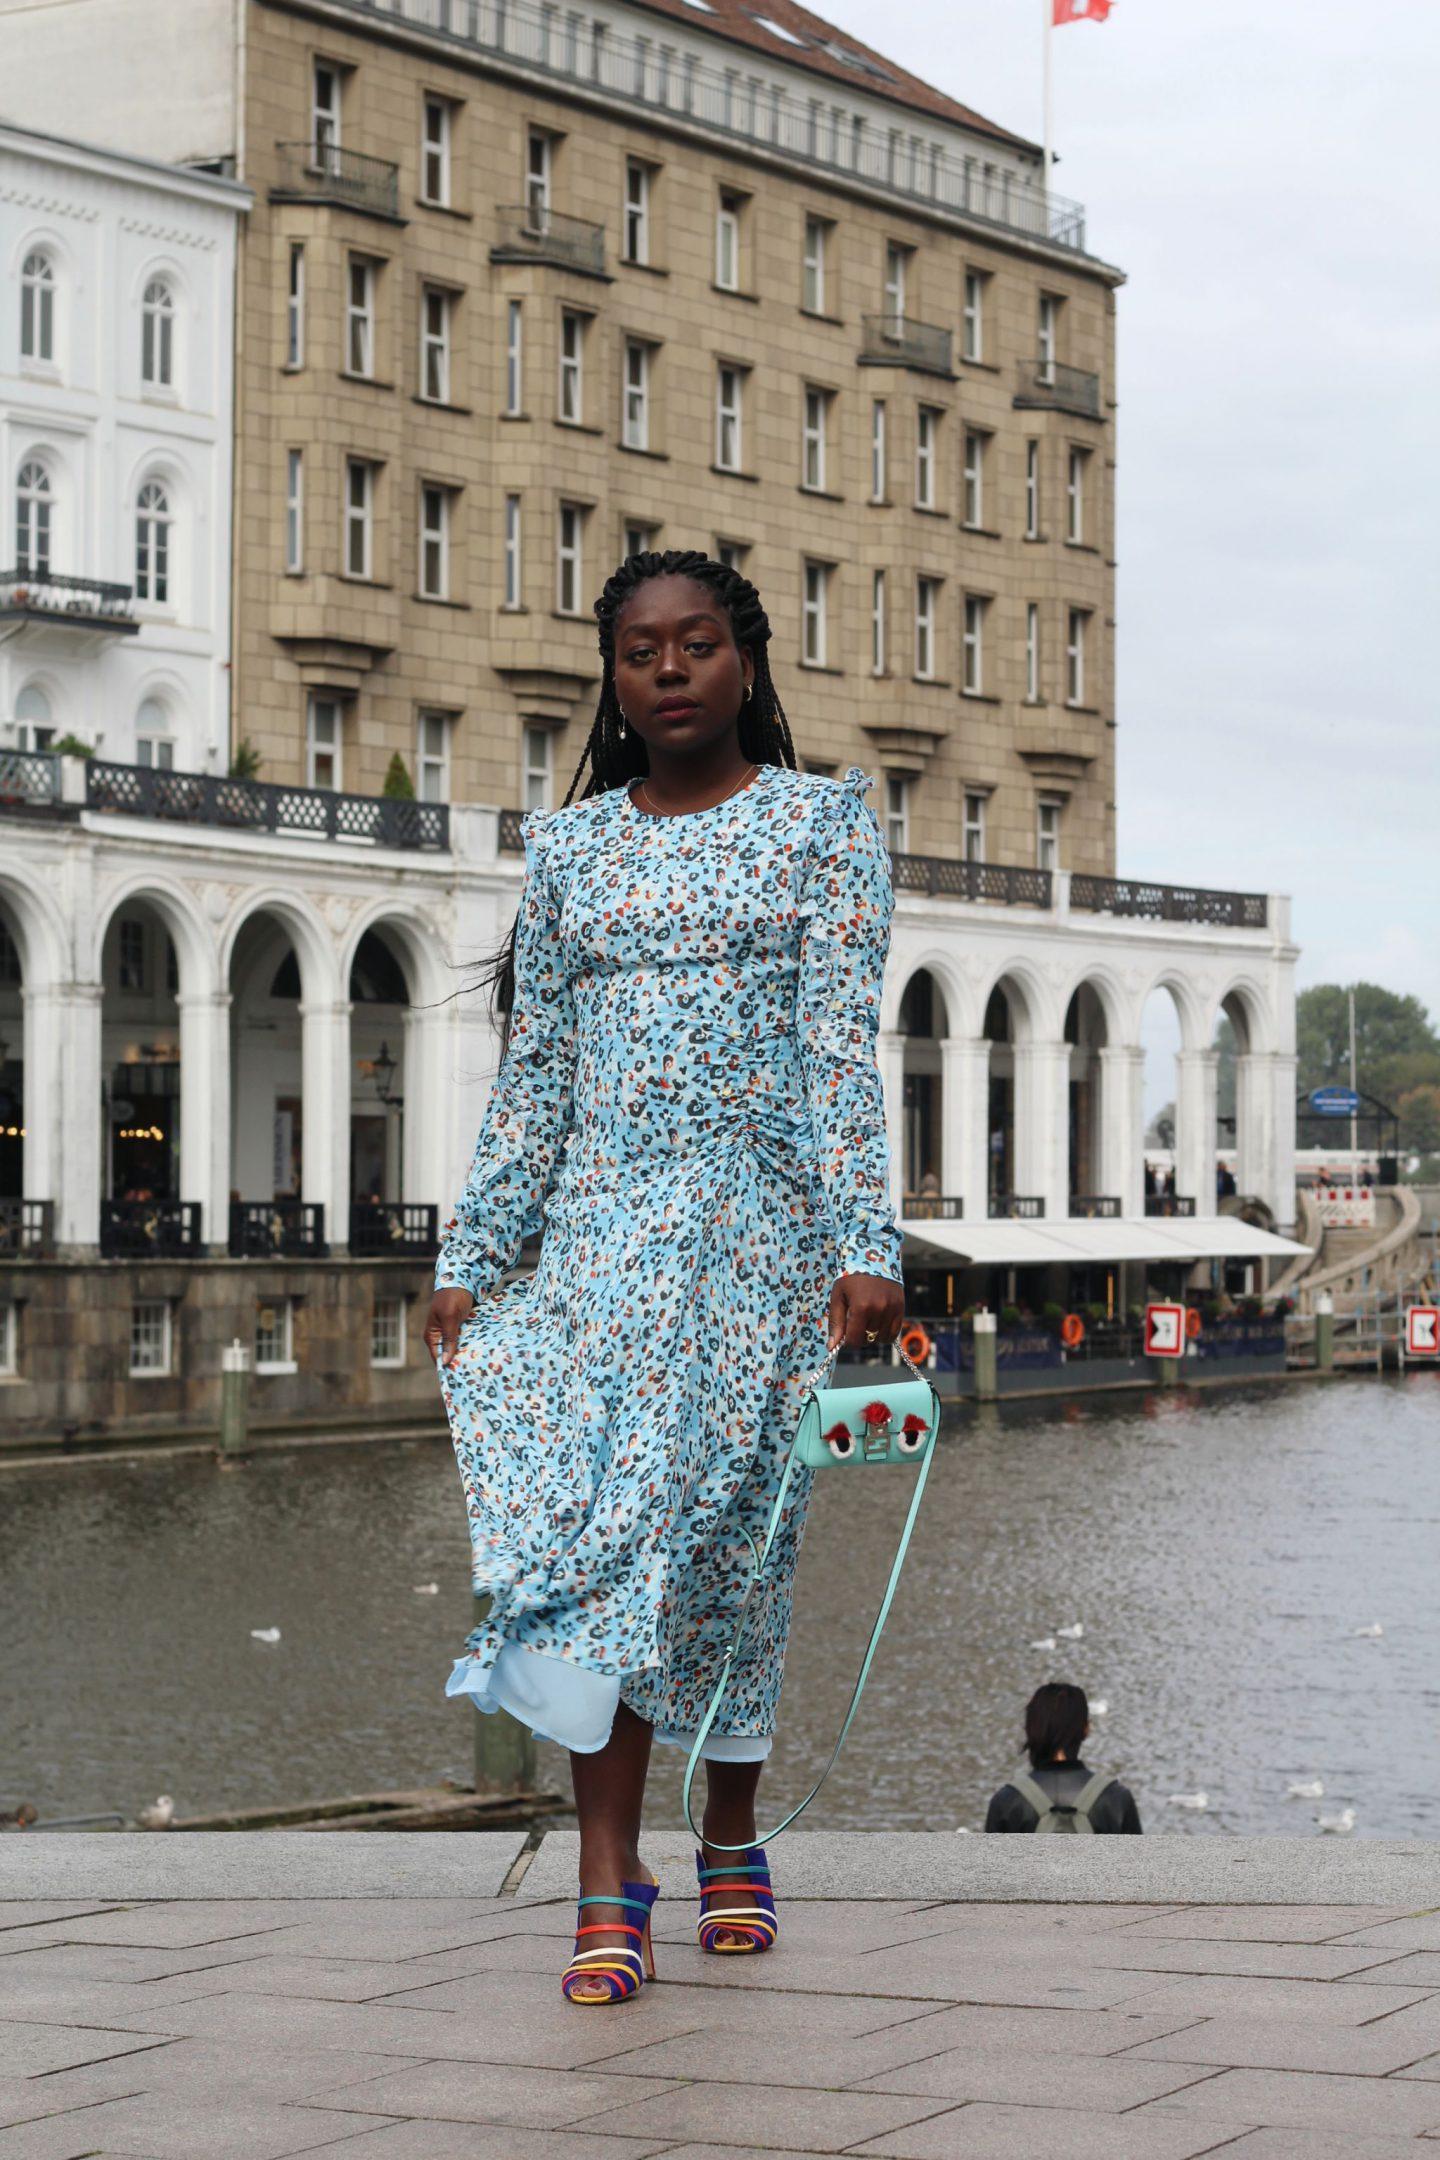 Lala_Berlin_Streetstyle_Lois_Opoku_Fashion_Blogger_Fendi_Monster_Malone_Souliers_1